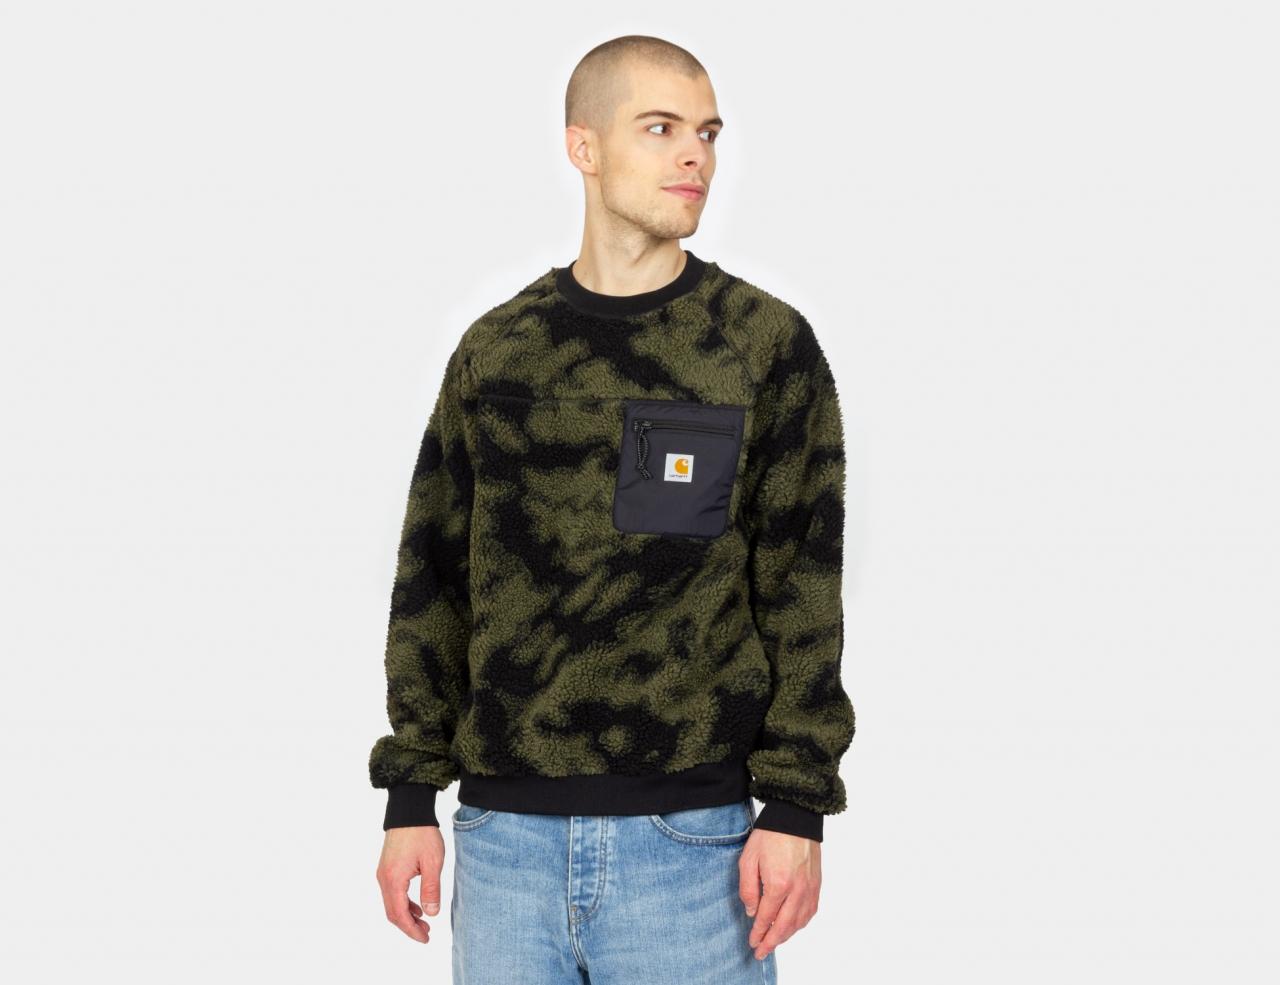 Carhartt WIP Prentis Sweatshirt - Camo Green